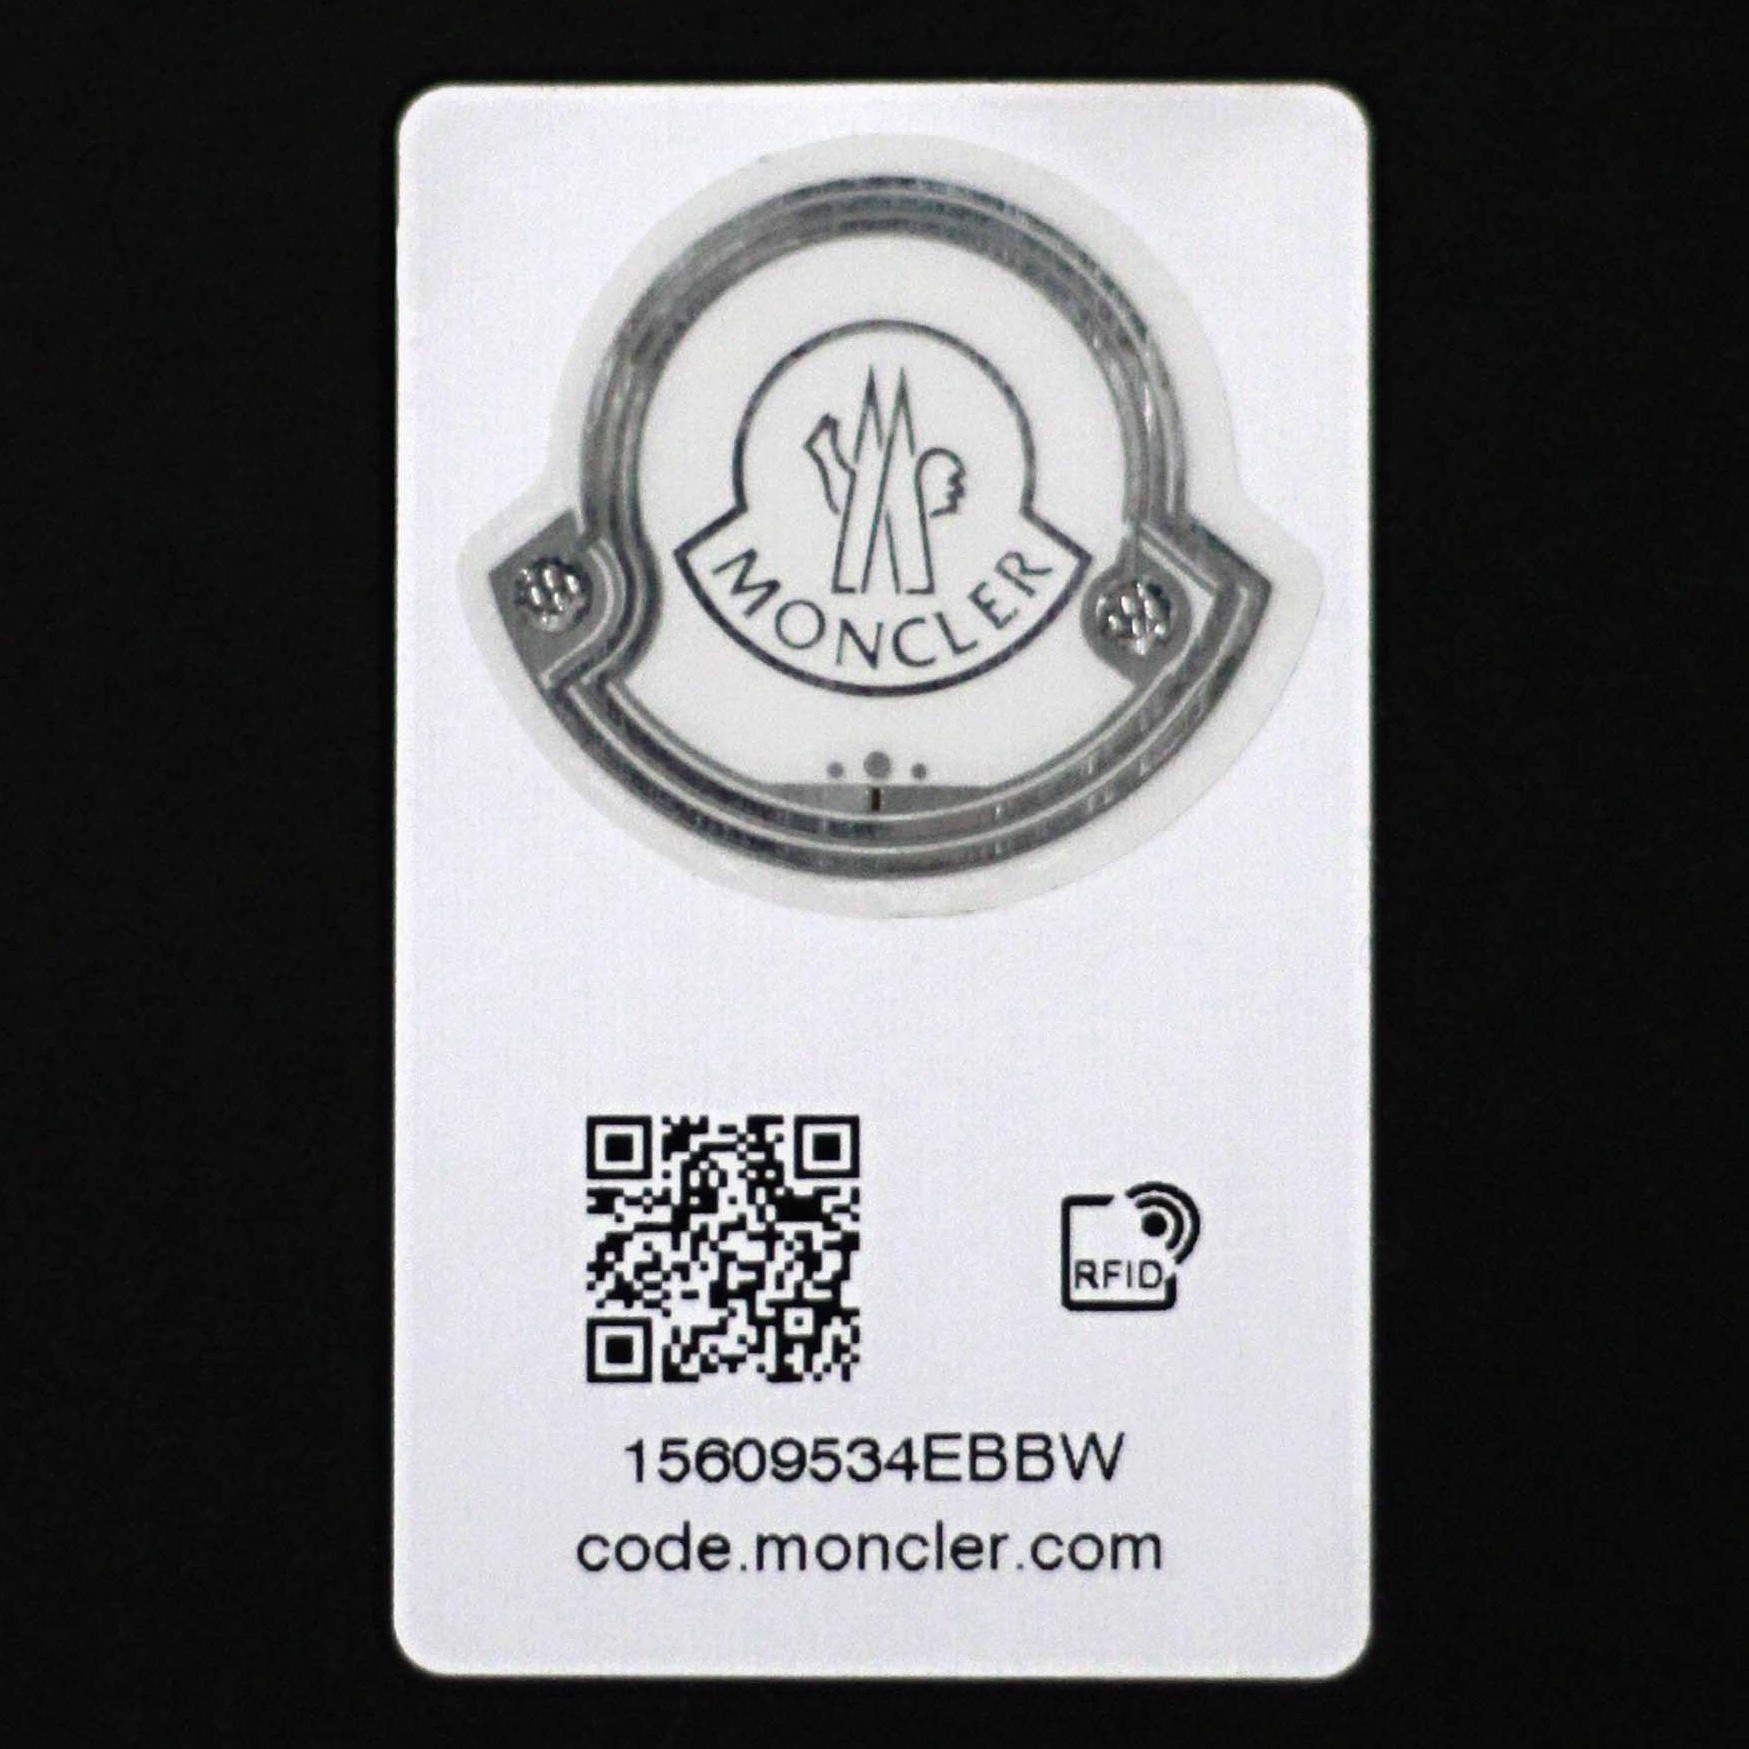 Moncler's RFID chip